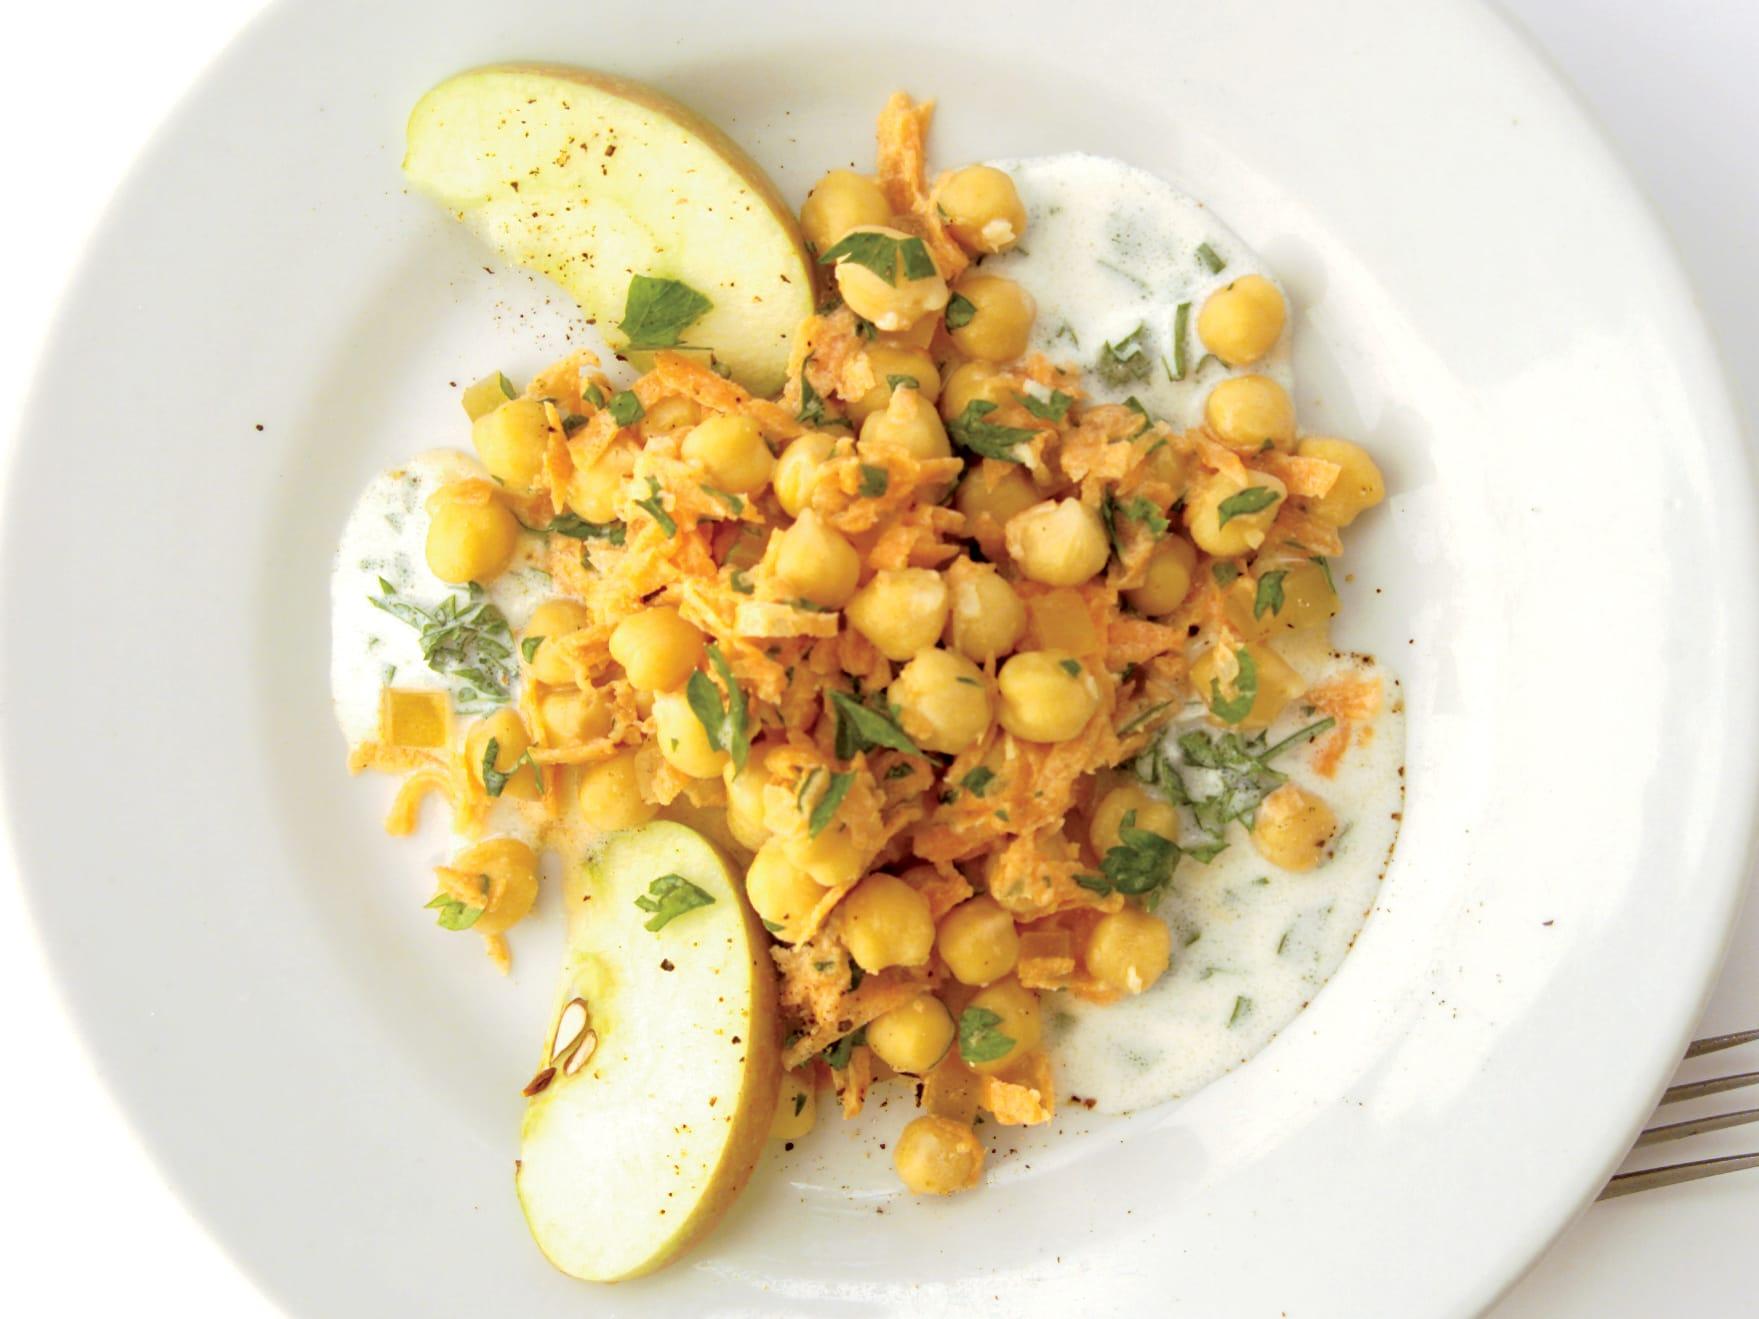 Rüebli-Kichererbsen-Salat mit kandiertem Ingwer